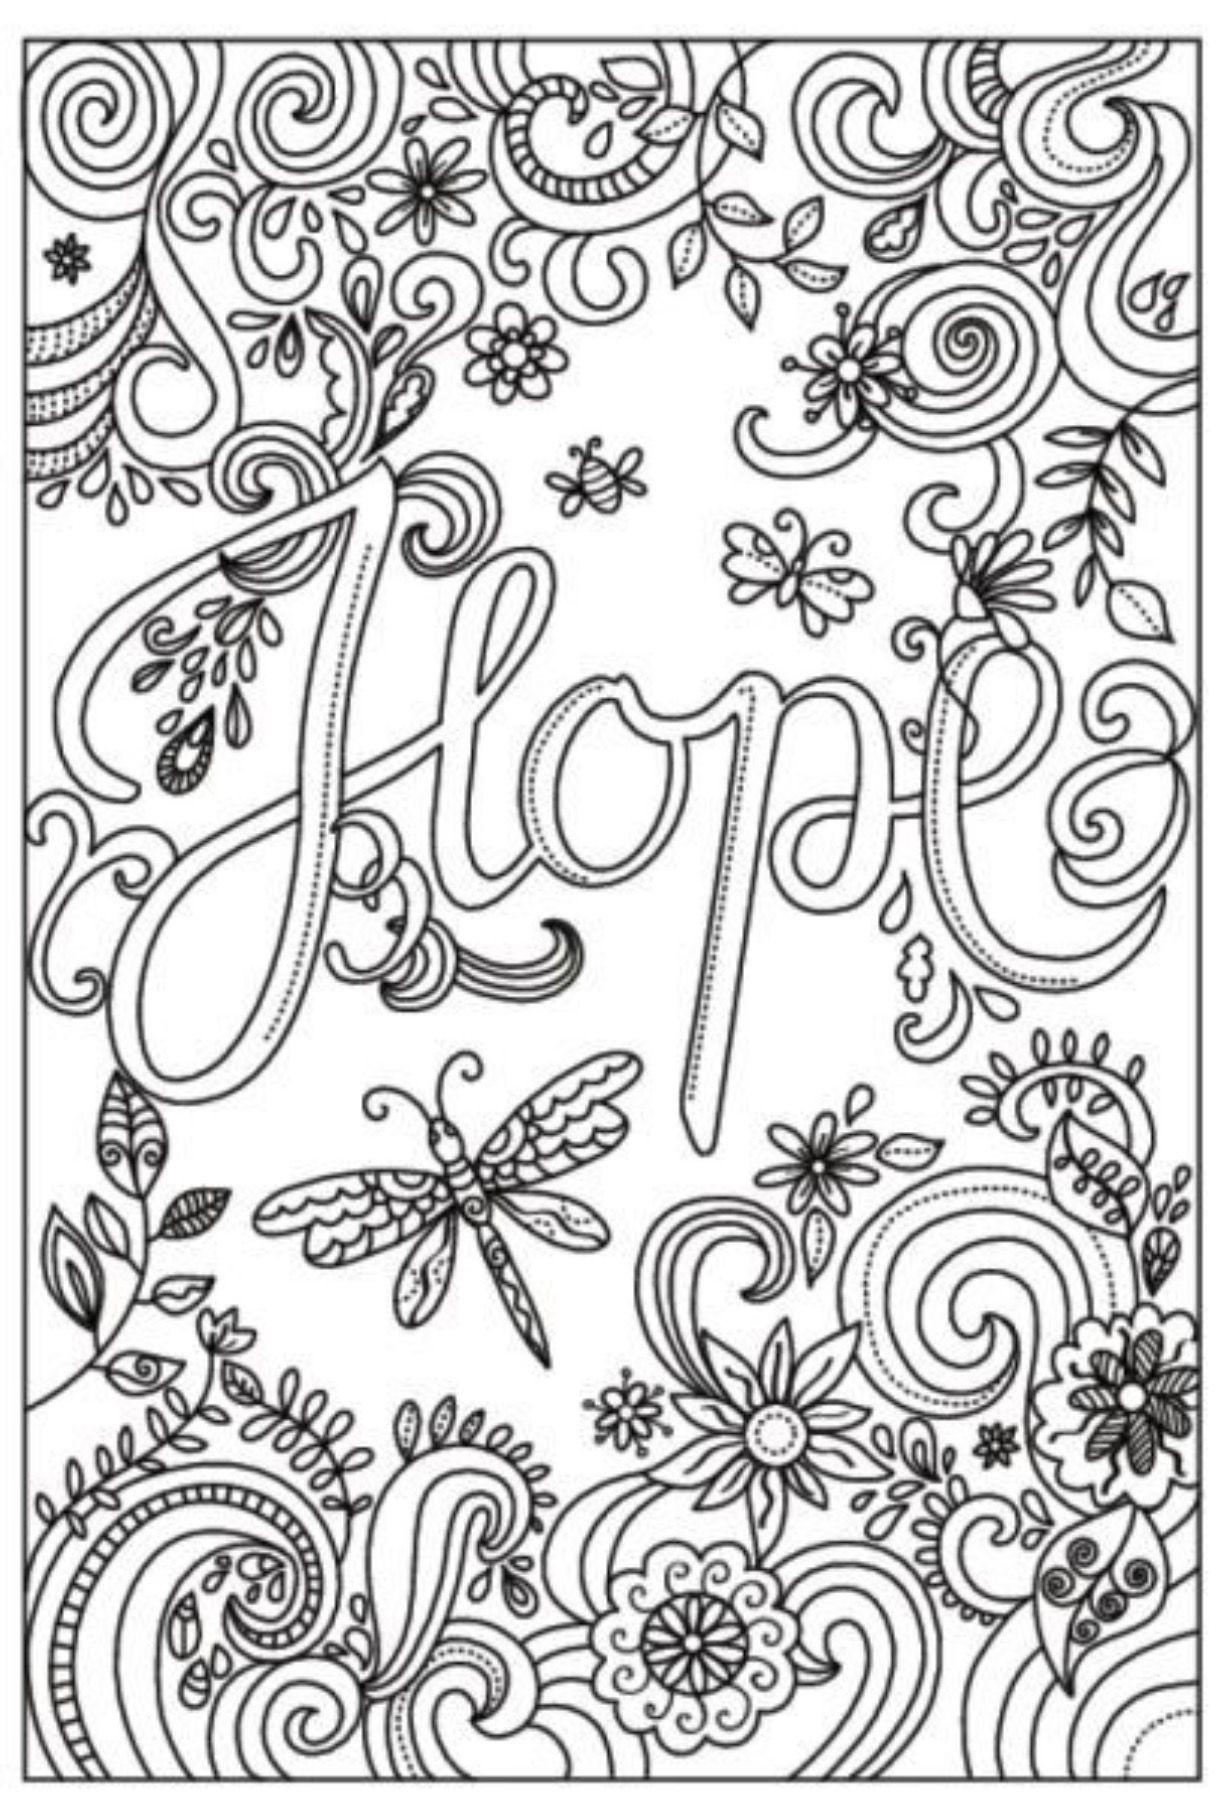 Pin von Teresa Douglas auf Coloring Pages   Coloring books, Coloring ...